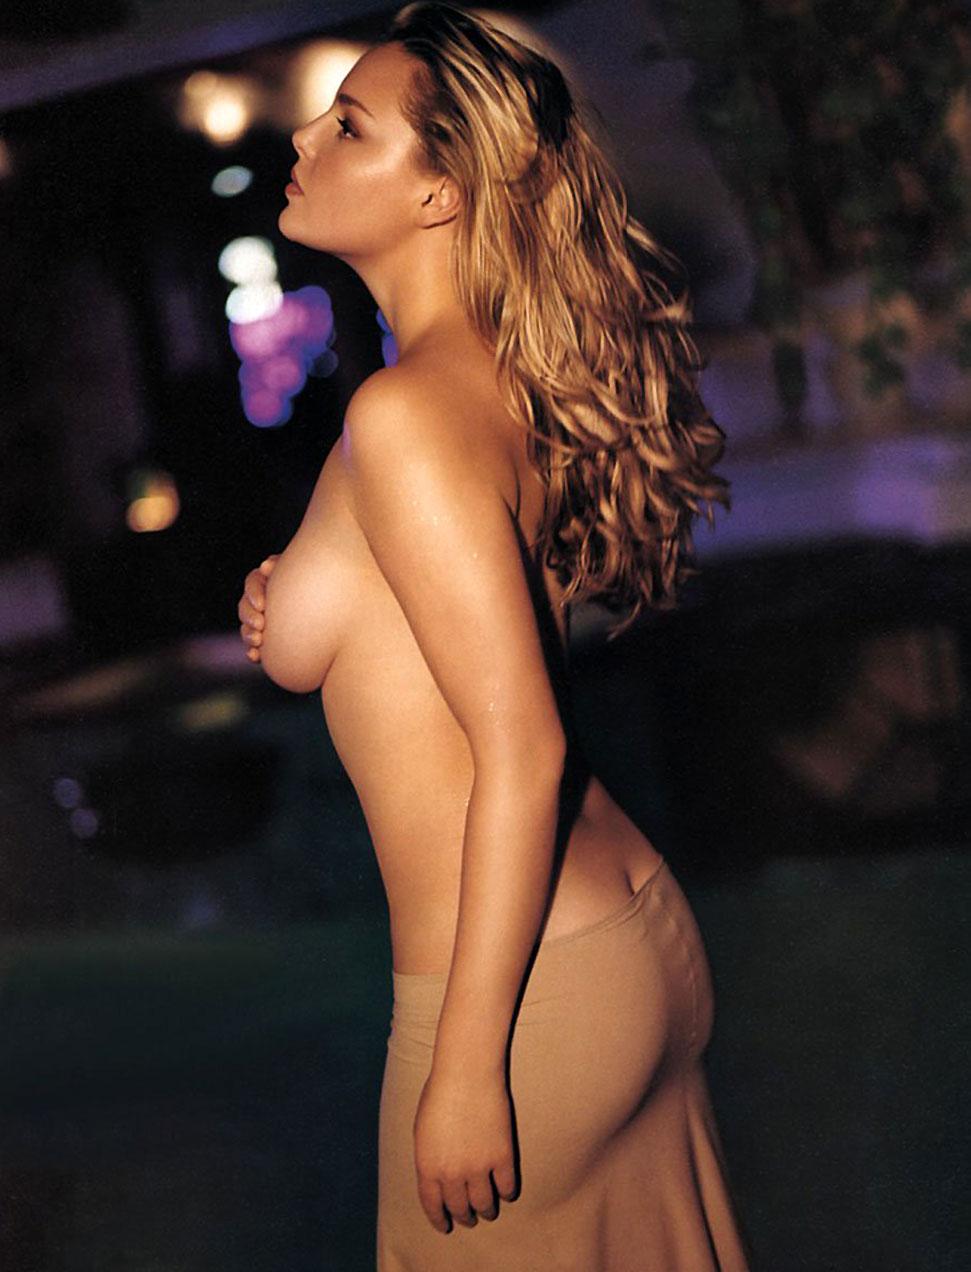 Katherine heigl nude playboy